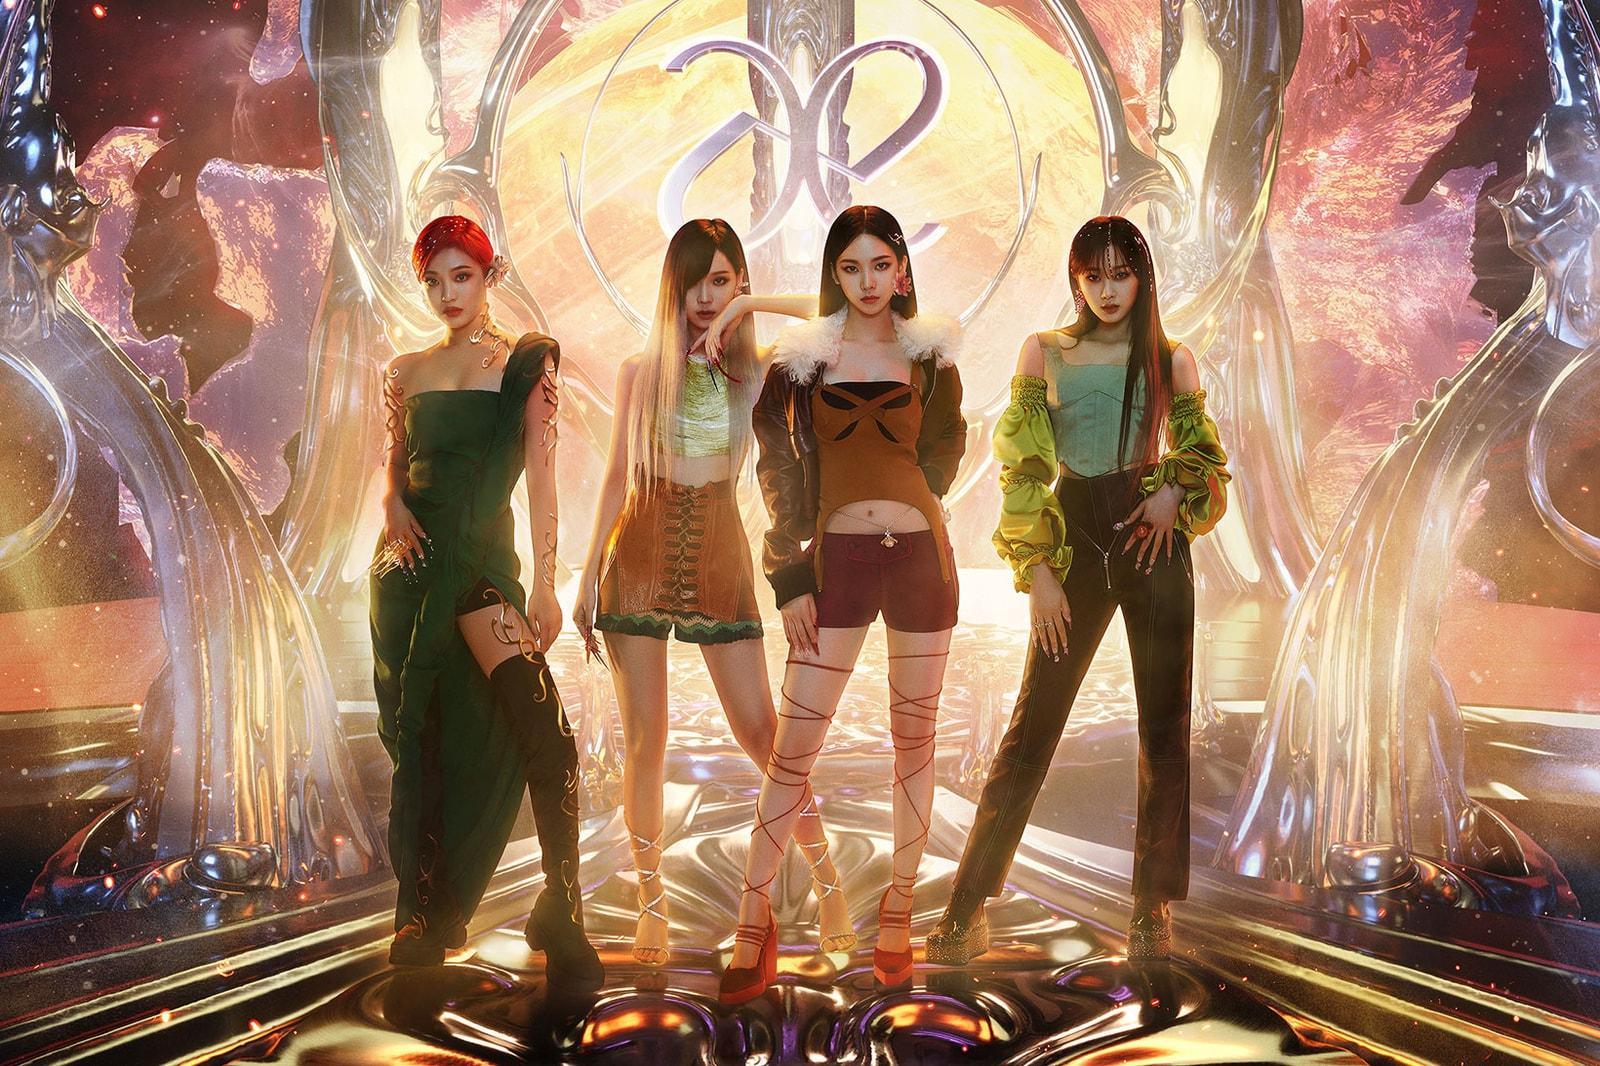 aespa next level single release concept image ningning karina winter giselle k-pop